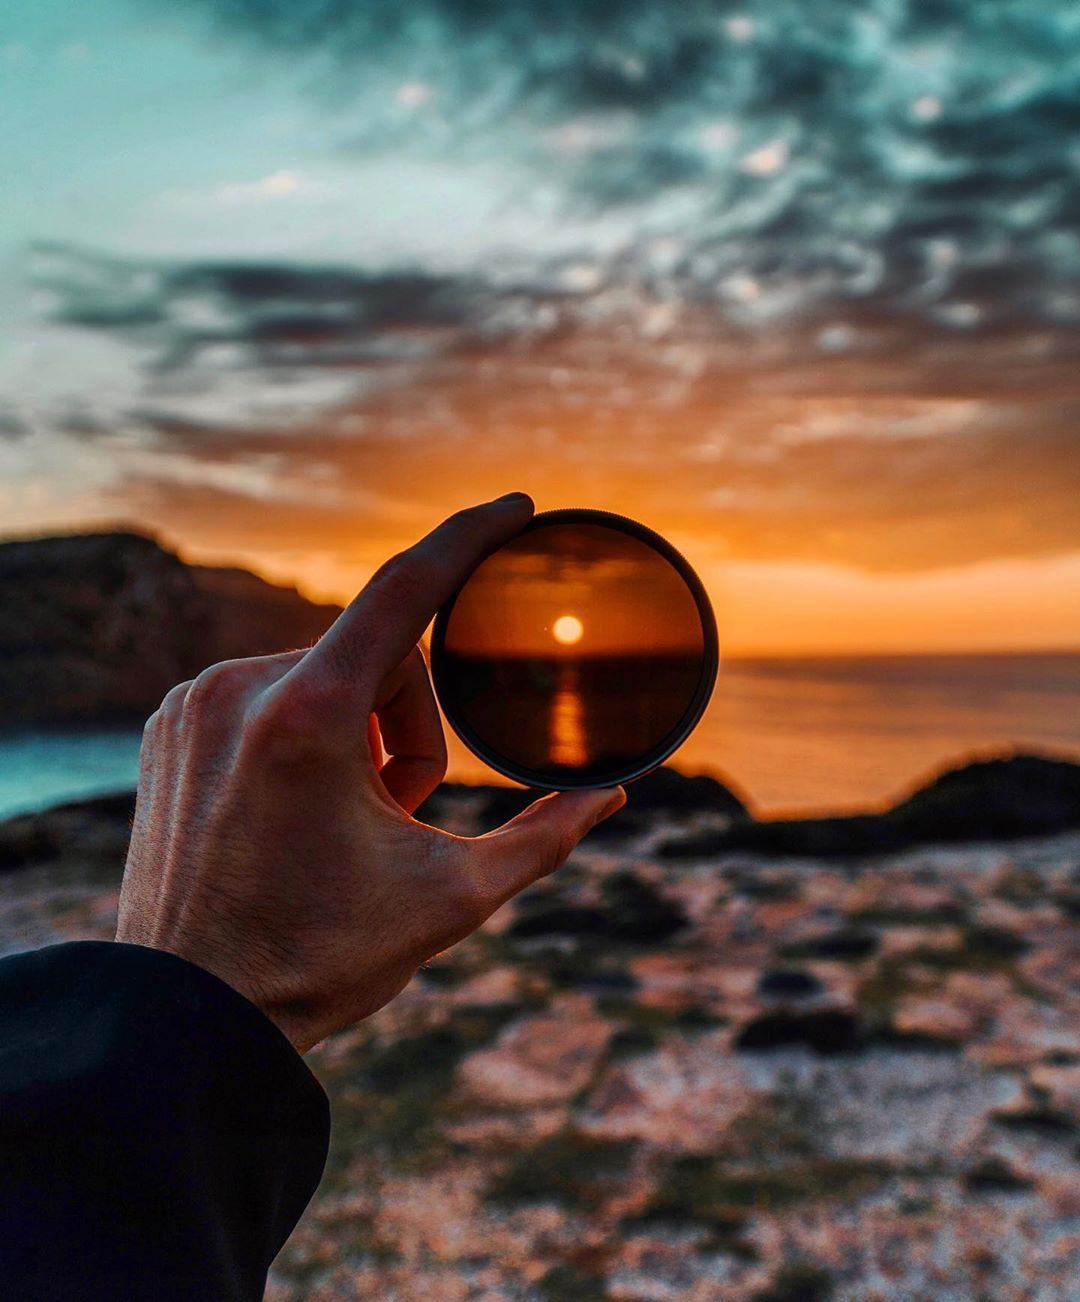 Hybrid Pro Filters Dslr Mirrorless In 2020 Light Pollution Dslr Filters